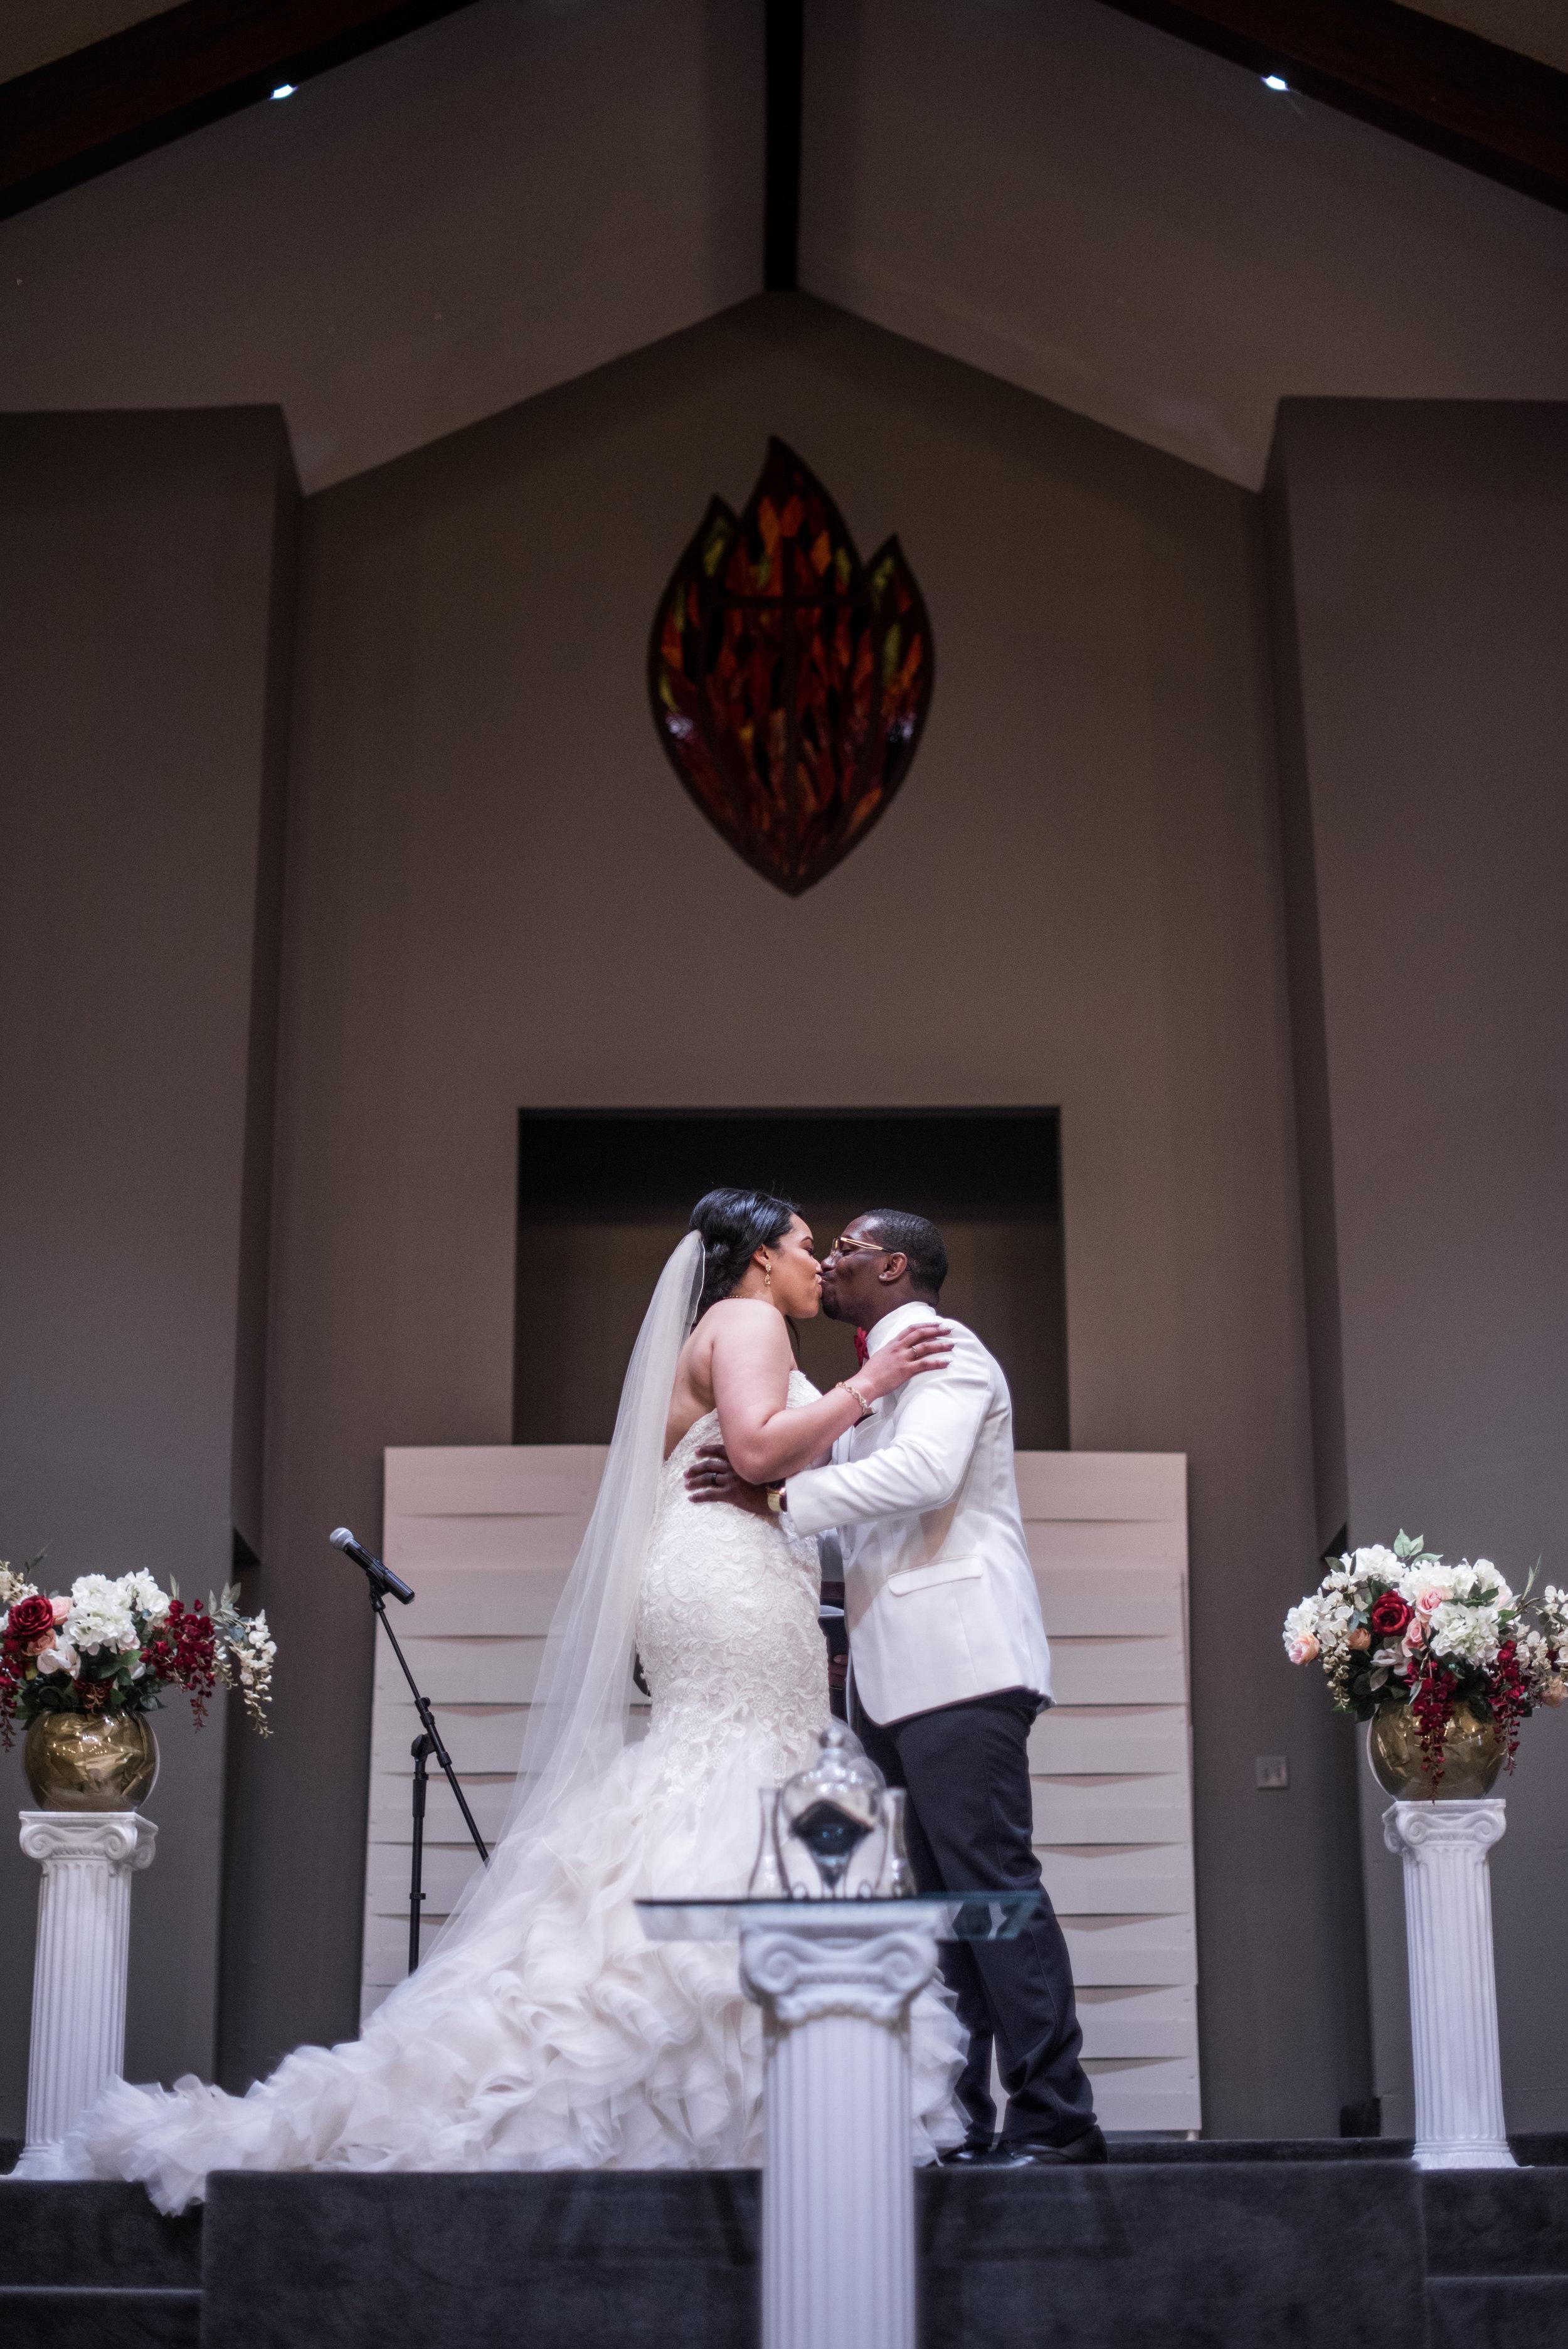 Burlington Iowa Wedding Midwest Photographer Melissa Cervantes _ Chantelle and Isaiah 552aa.jpg